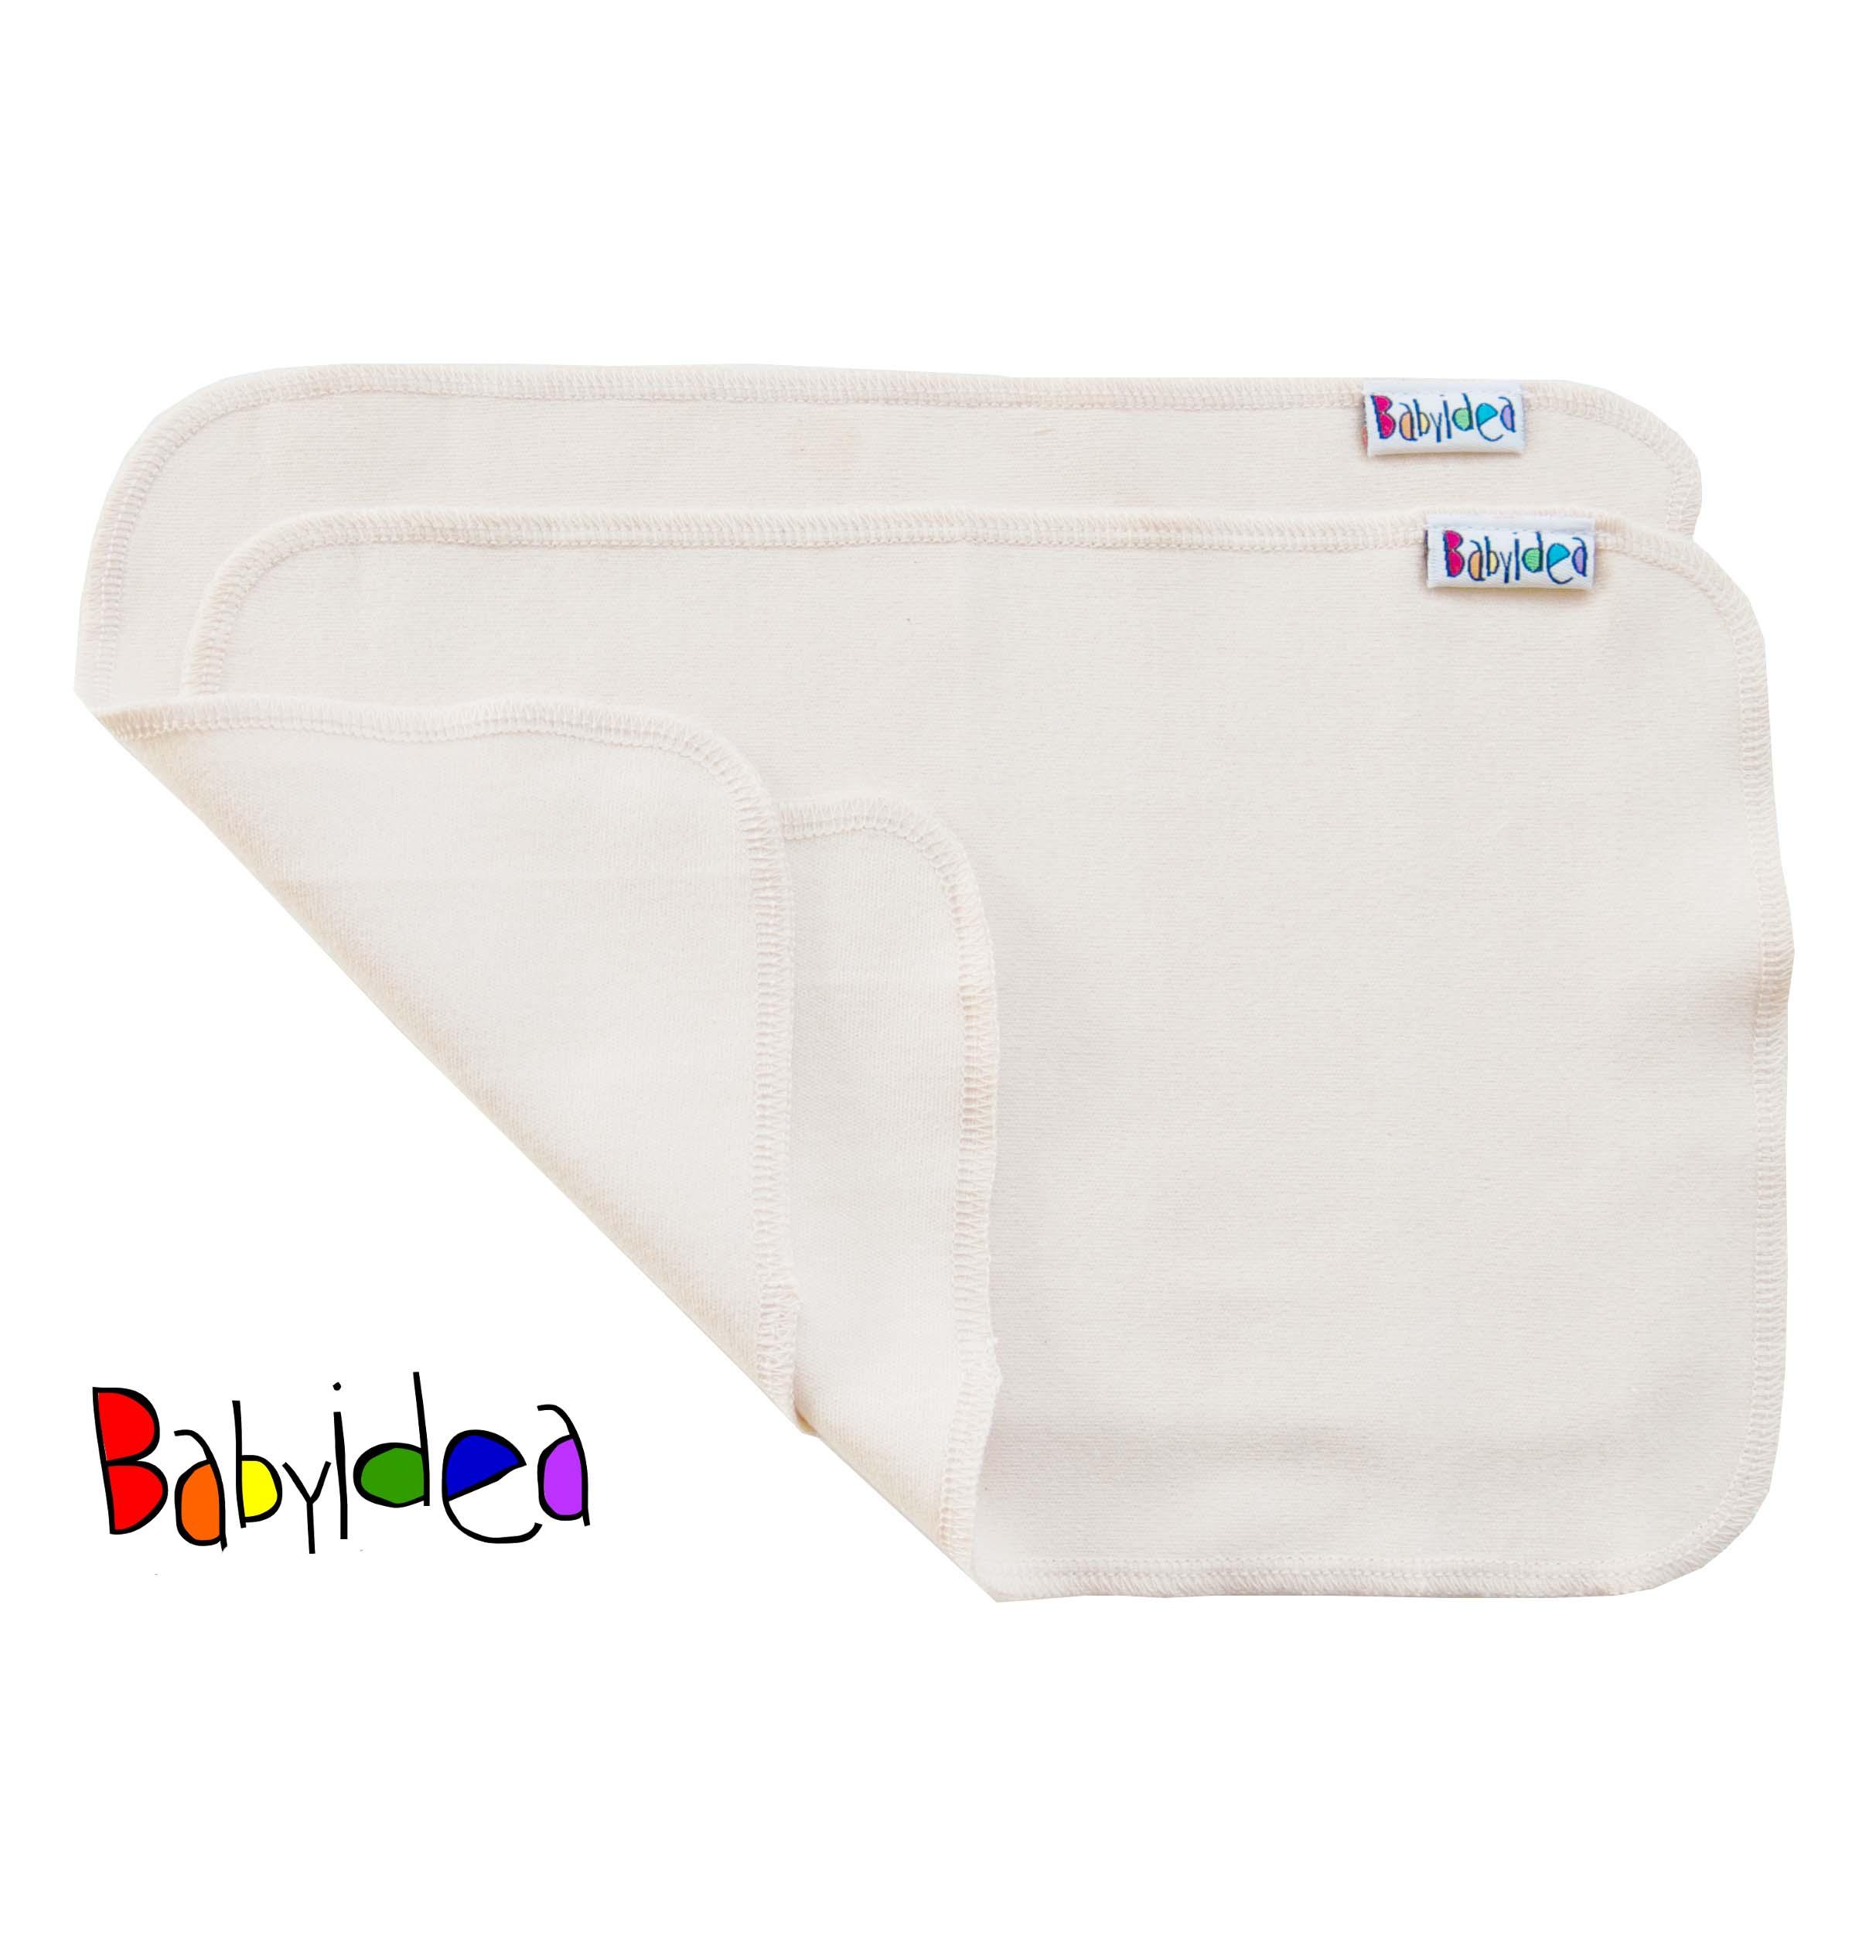 Köp Babyidea Cream Line Care Liner - Lilla Lammet dc0f88969523e